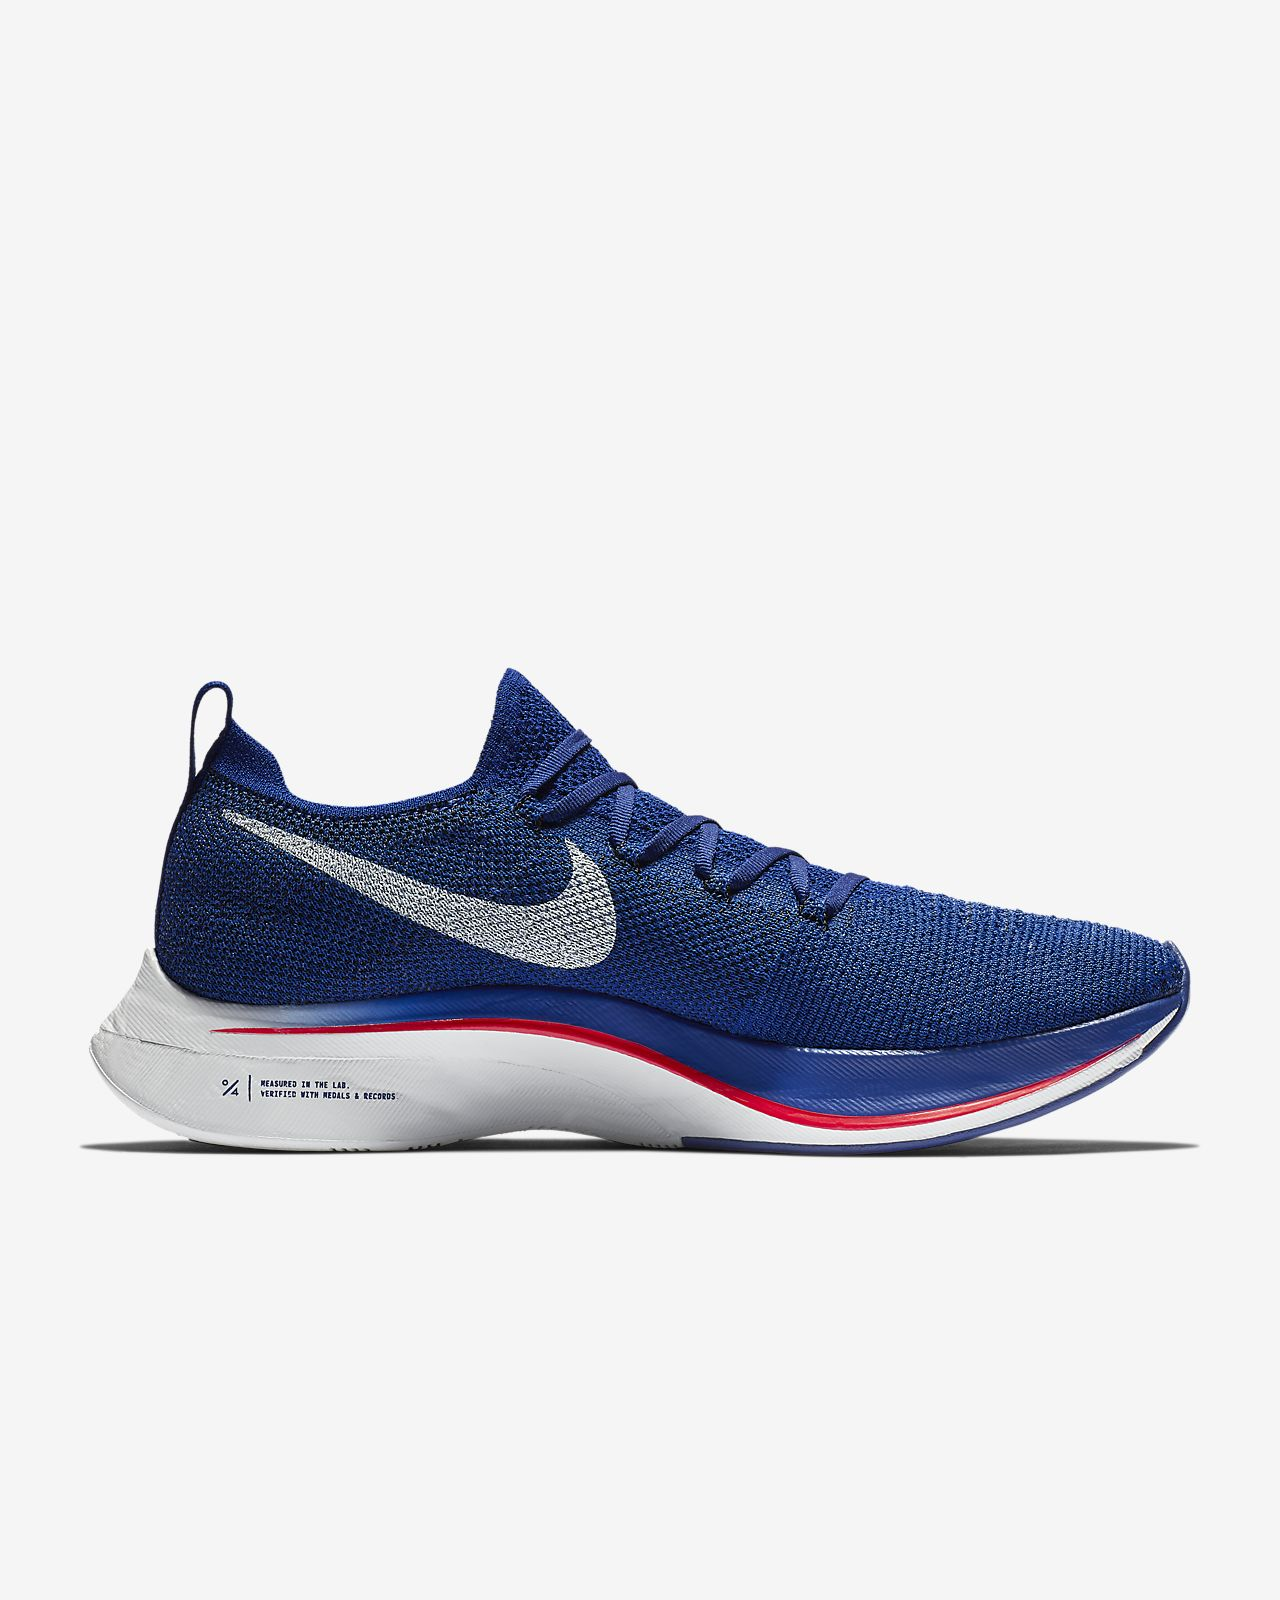 baddebd782747d Nike Vaporfly 4% Flyknit Running Shoe. Nike.com AU